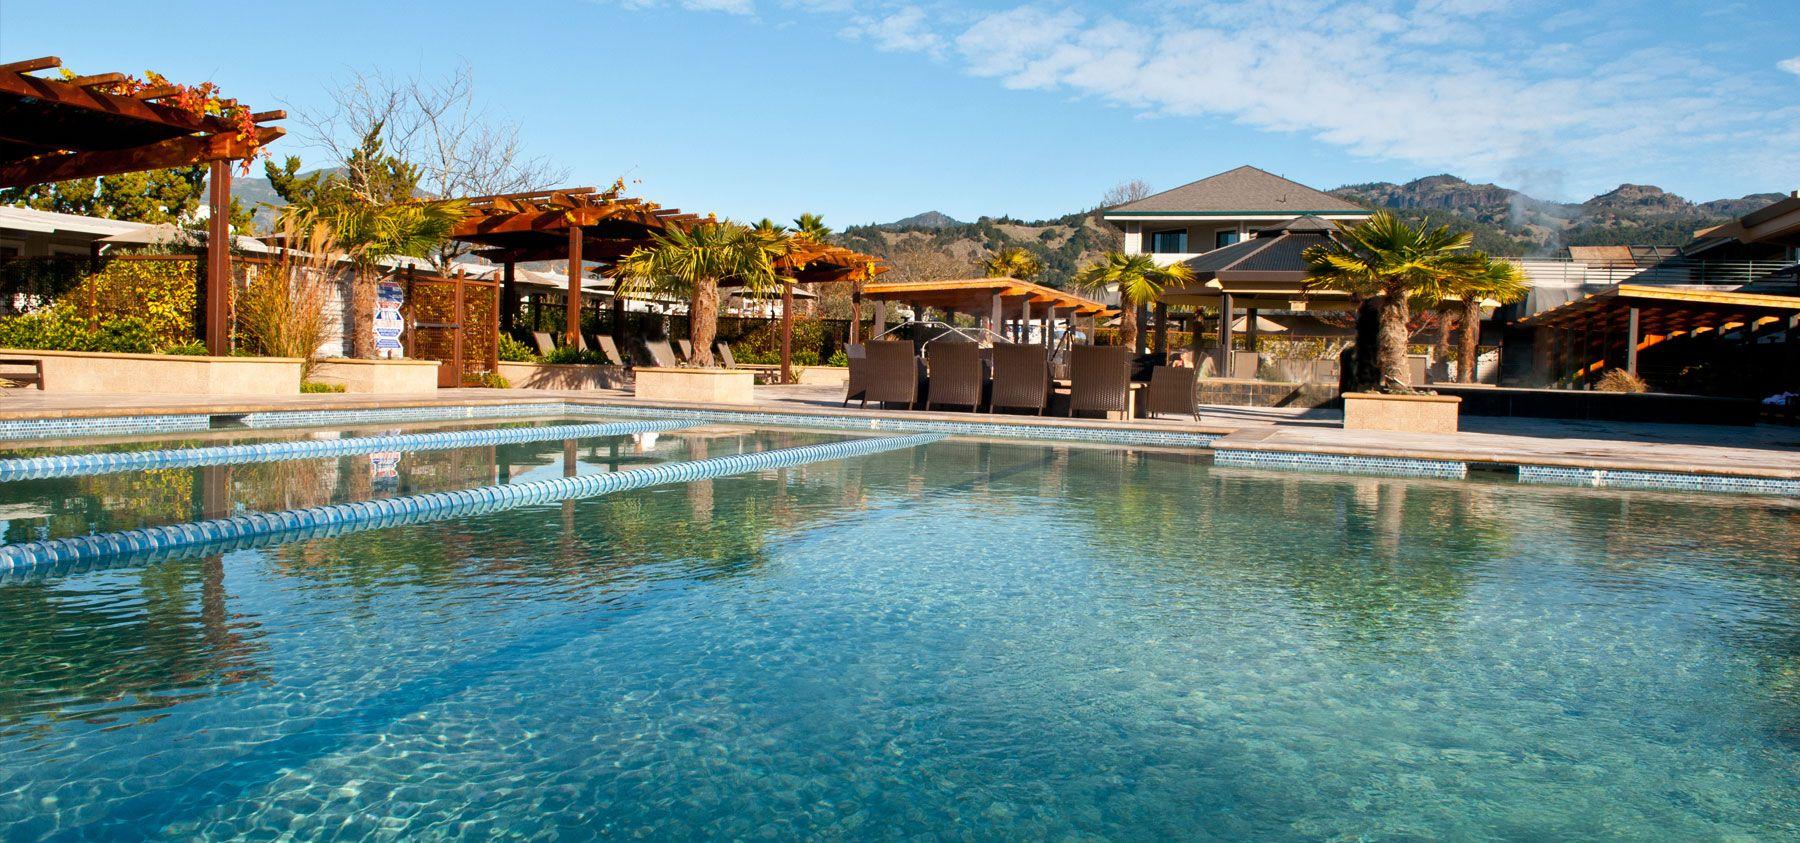 Relaxing Napa Valley Hotel Spa Napa Valley Hotels Calistoga Spa Napa Valley Calistoga